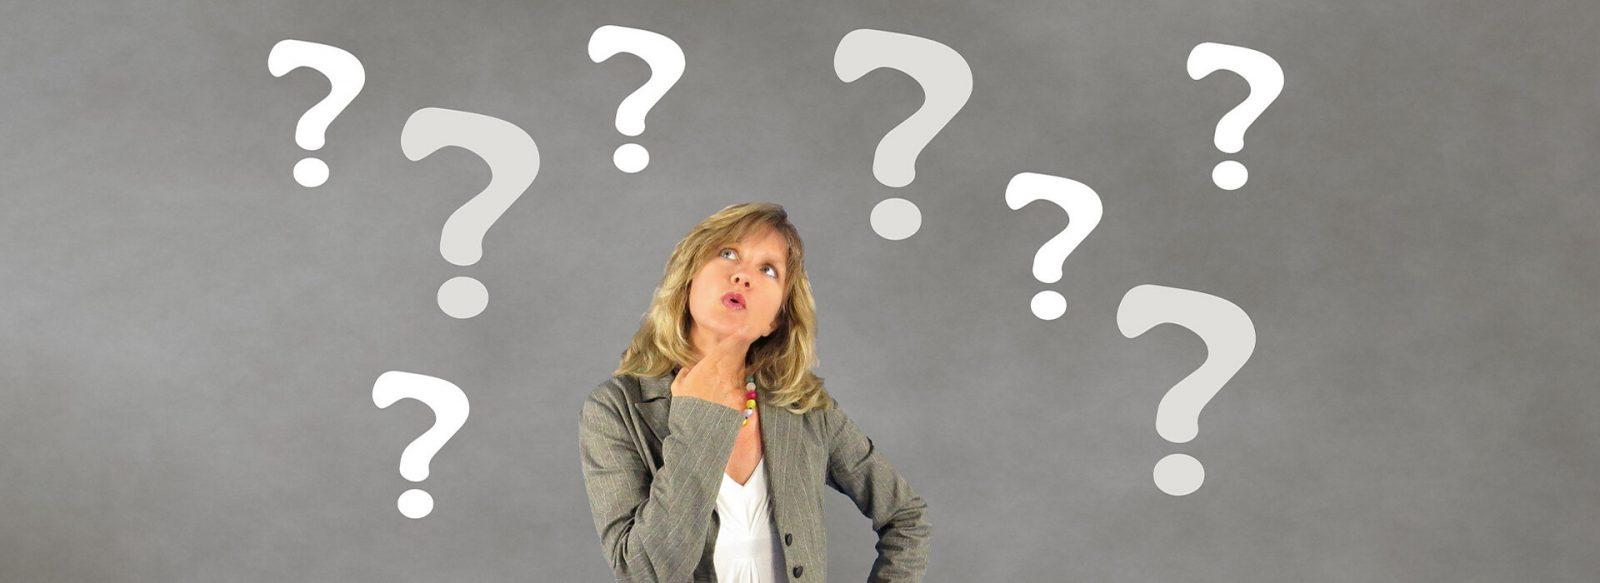 mujer rubia de saco gris y pantalón con signos de interrogación o pregunta en un fondo gris.